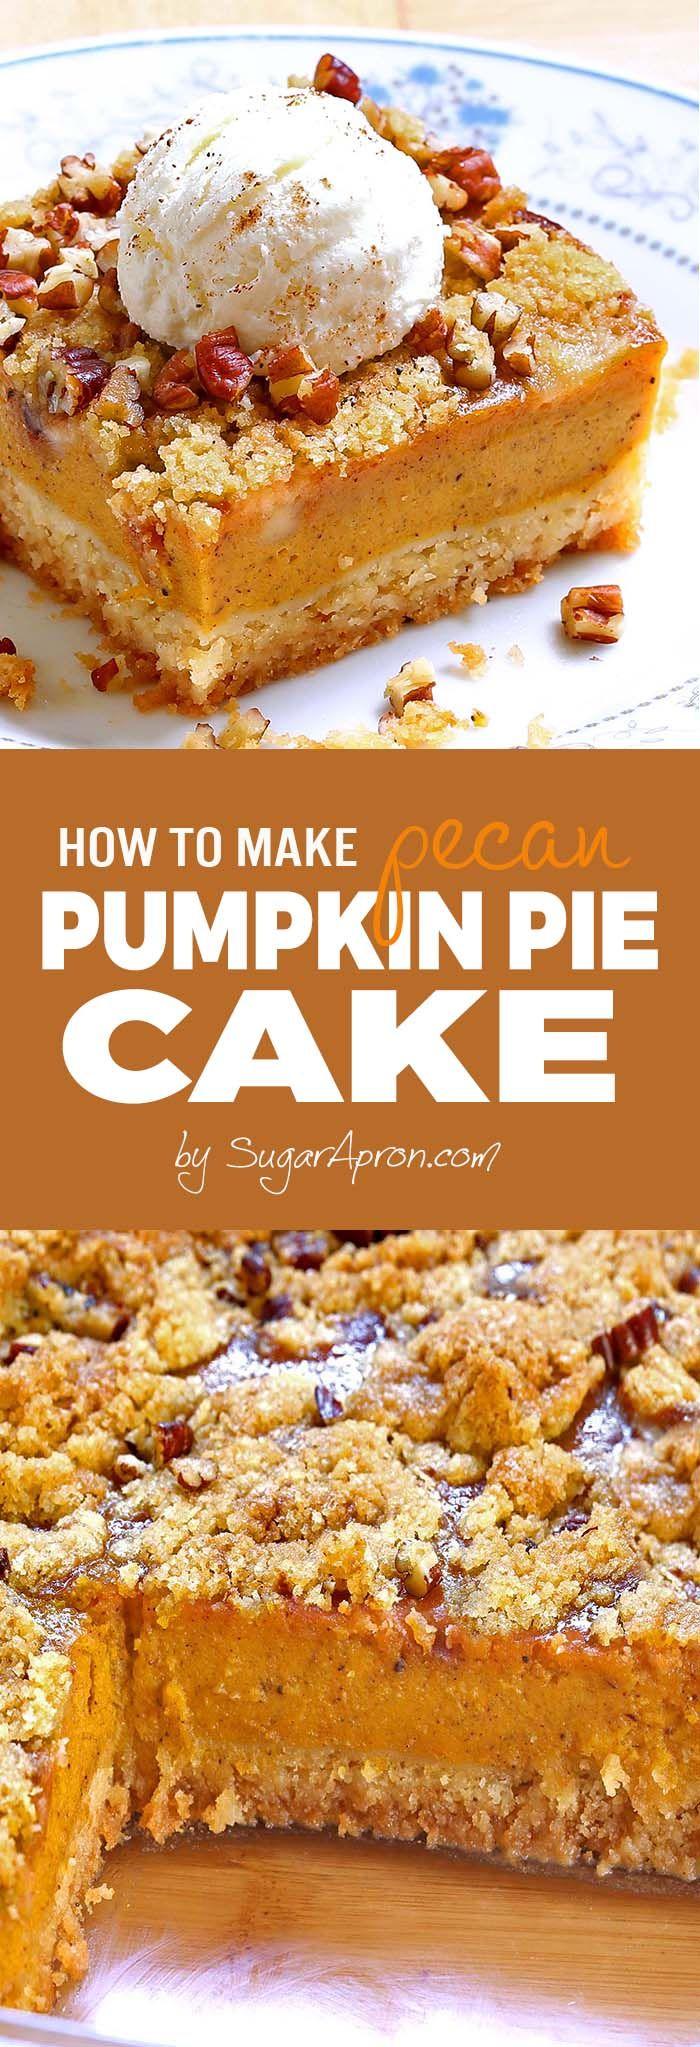 Pumpkin Pie Cake - Sugar Apron